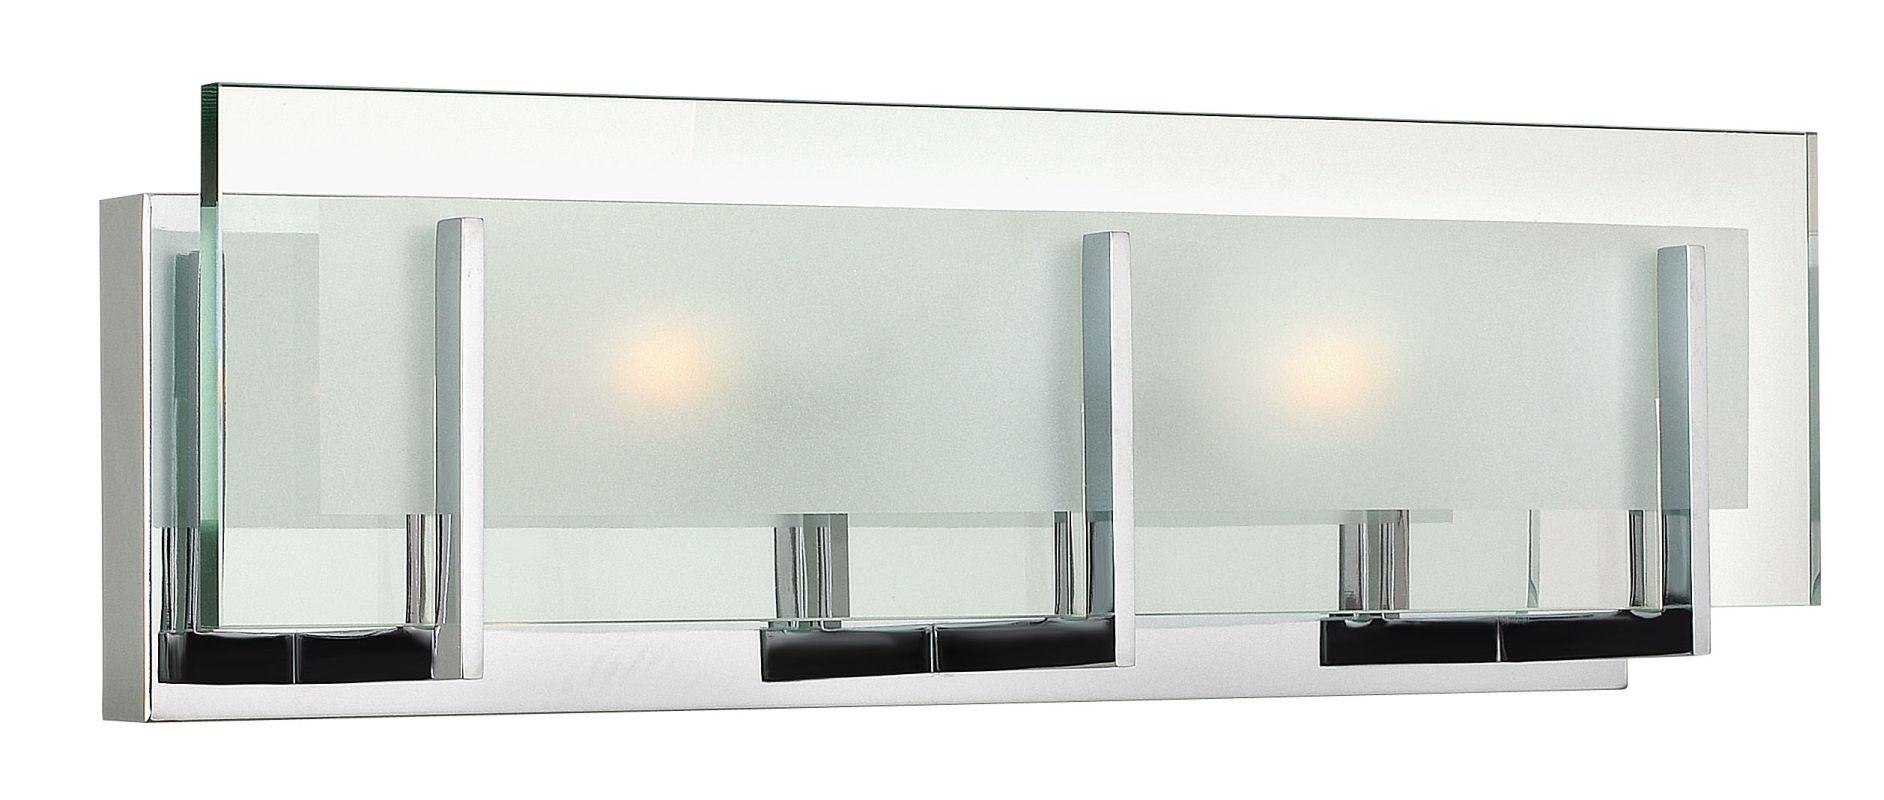 "Hinkley Lighting 5652 2 Light 18"" Width ADA Compliant Bath Bar from Sale $165.00 ITEM#: 2234000 MODEL# :5652CM UPC#: 640665565232 :"